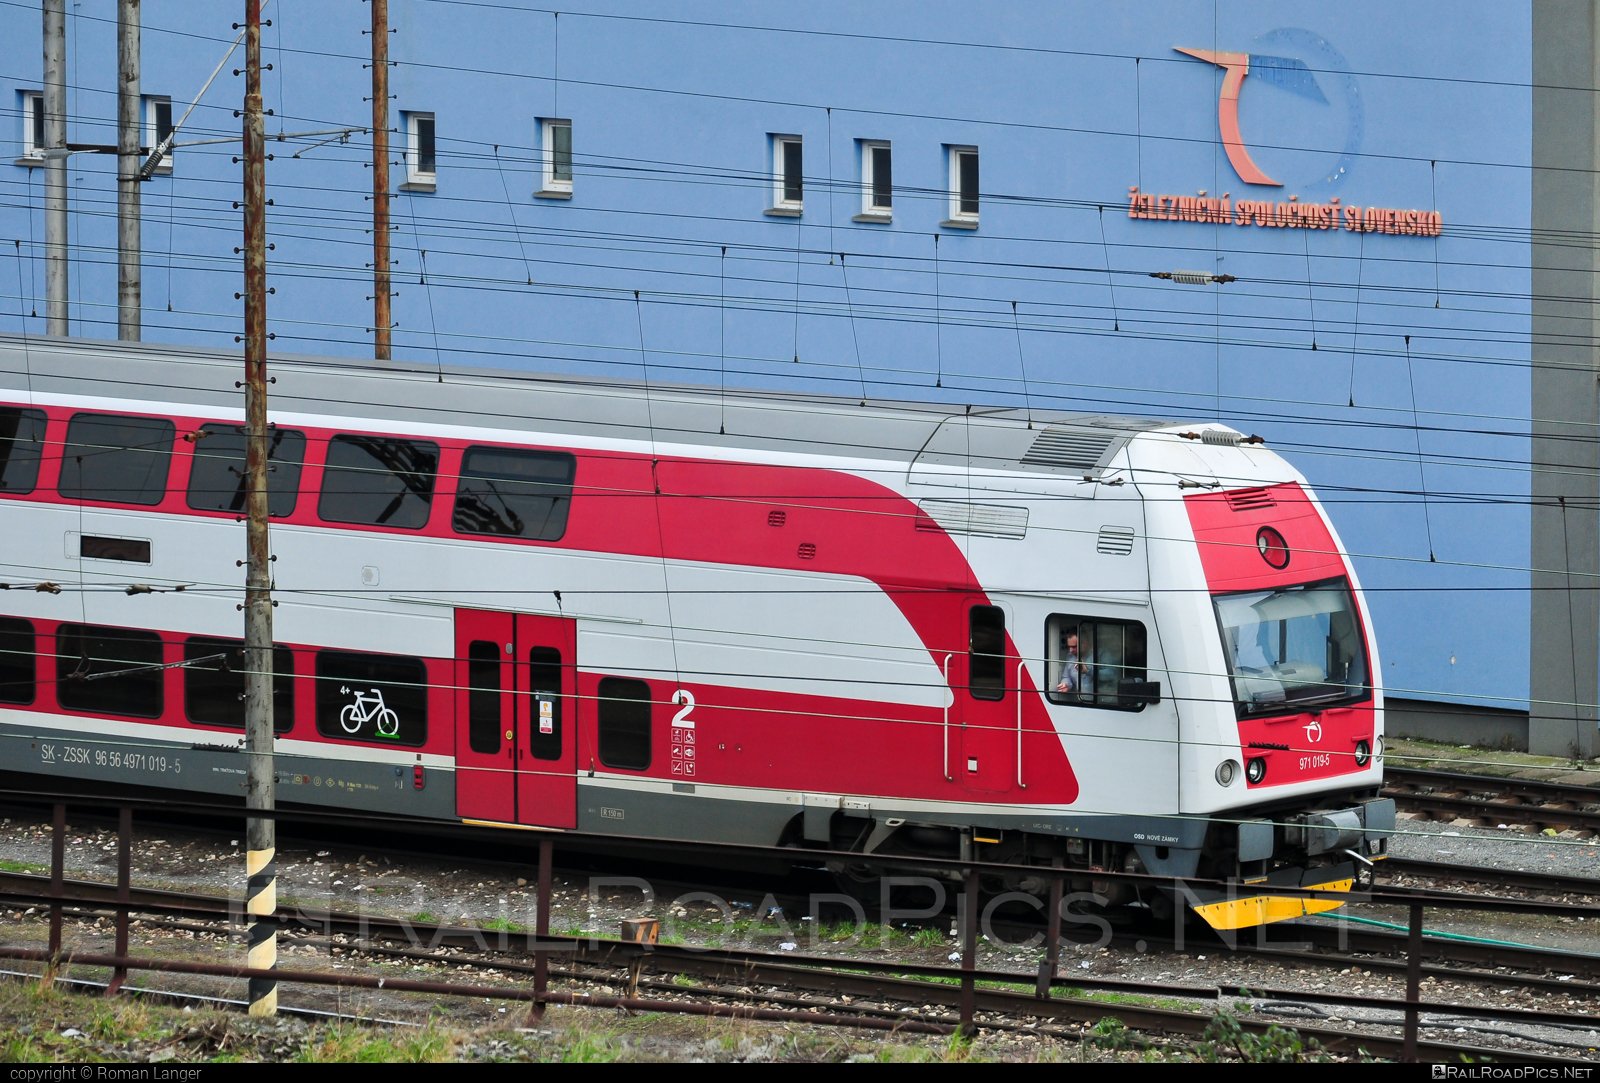 Škoda 4Ev - 971 019-5 operated by Železničná Spoločnost' Slovensko, a.s. #ZeleznicnaSpolocnostSlovensko #emu671 #skoda #skoda4ev #skodaclass671 #zssk